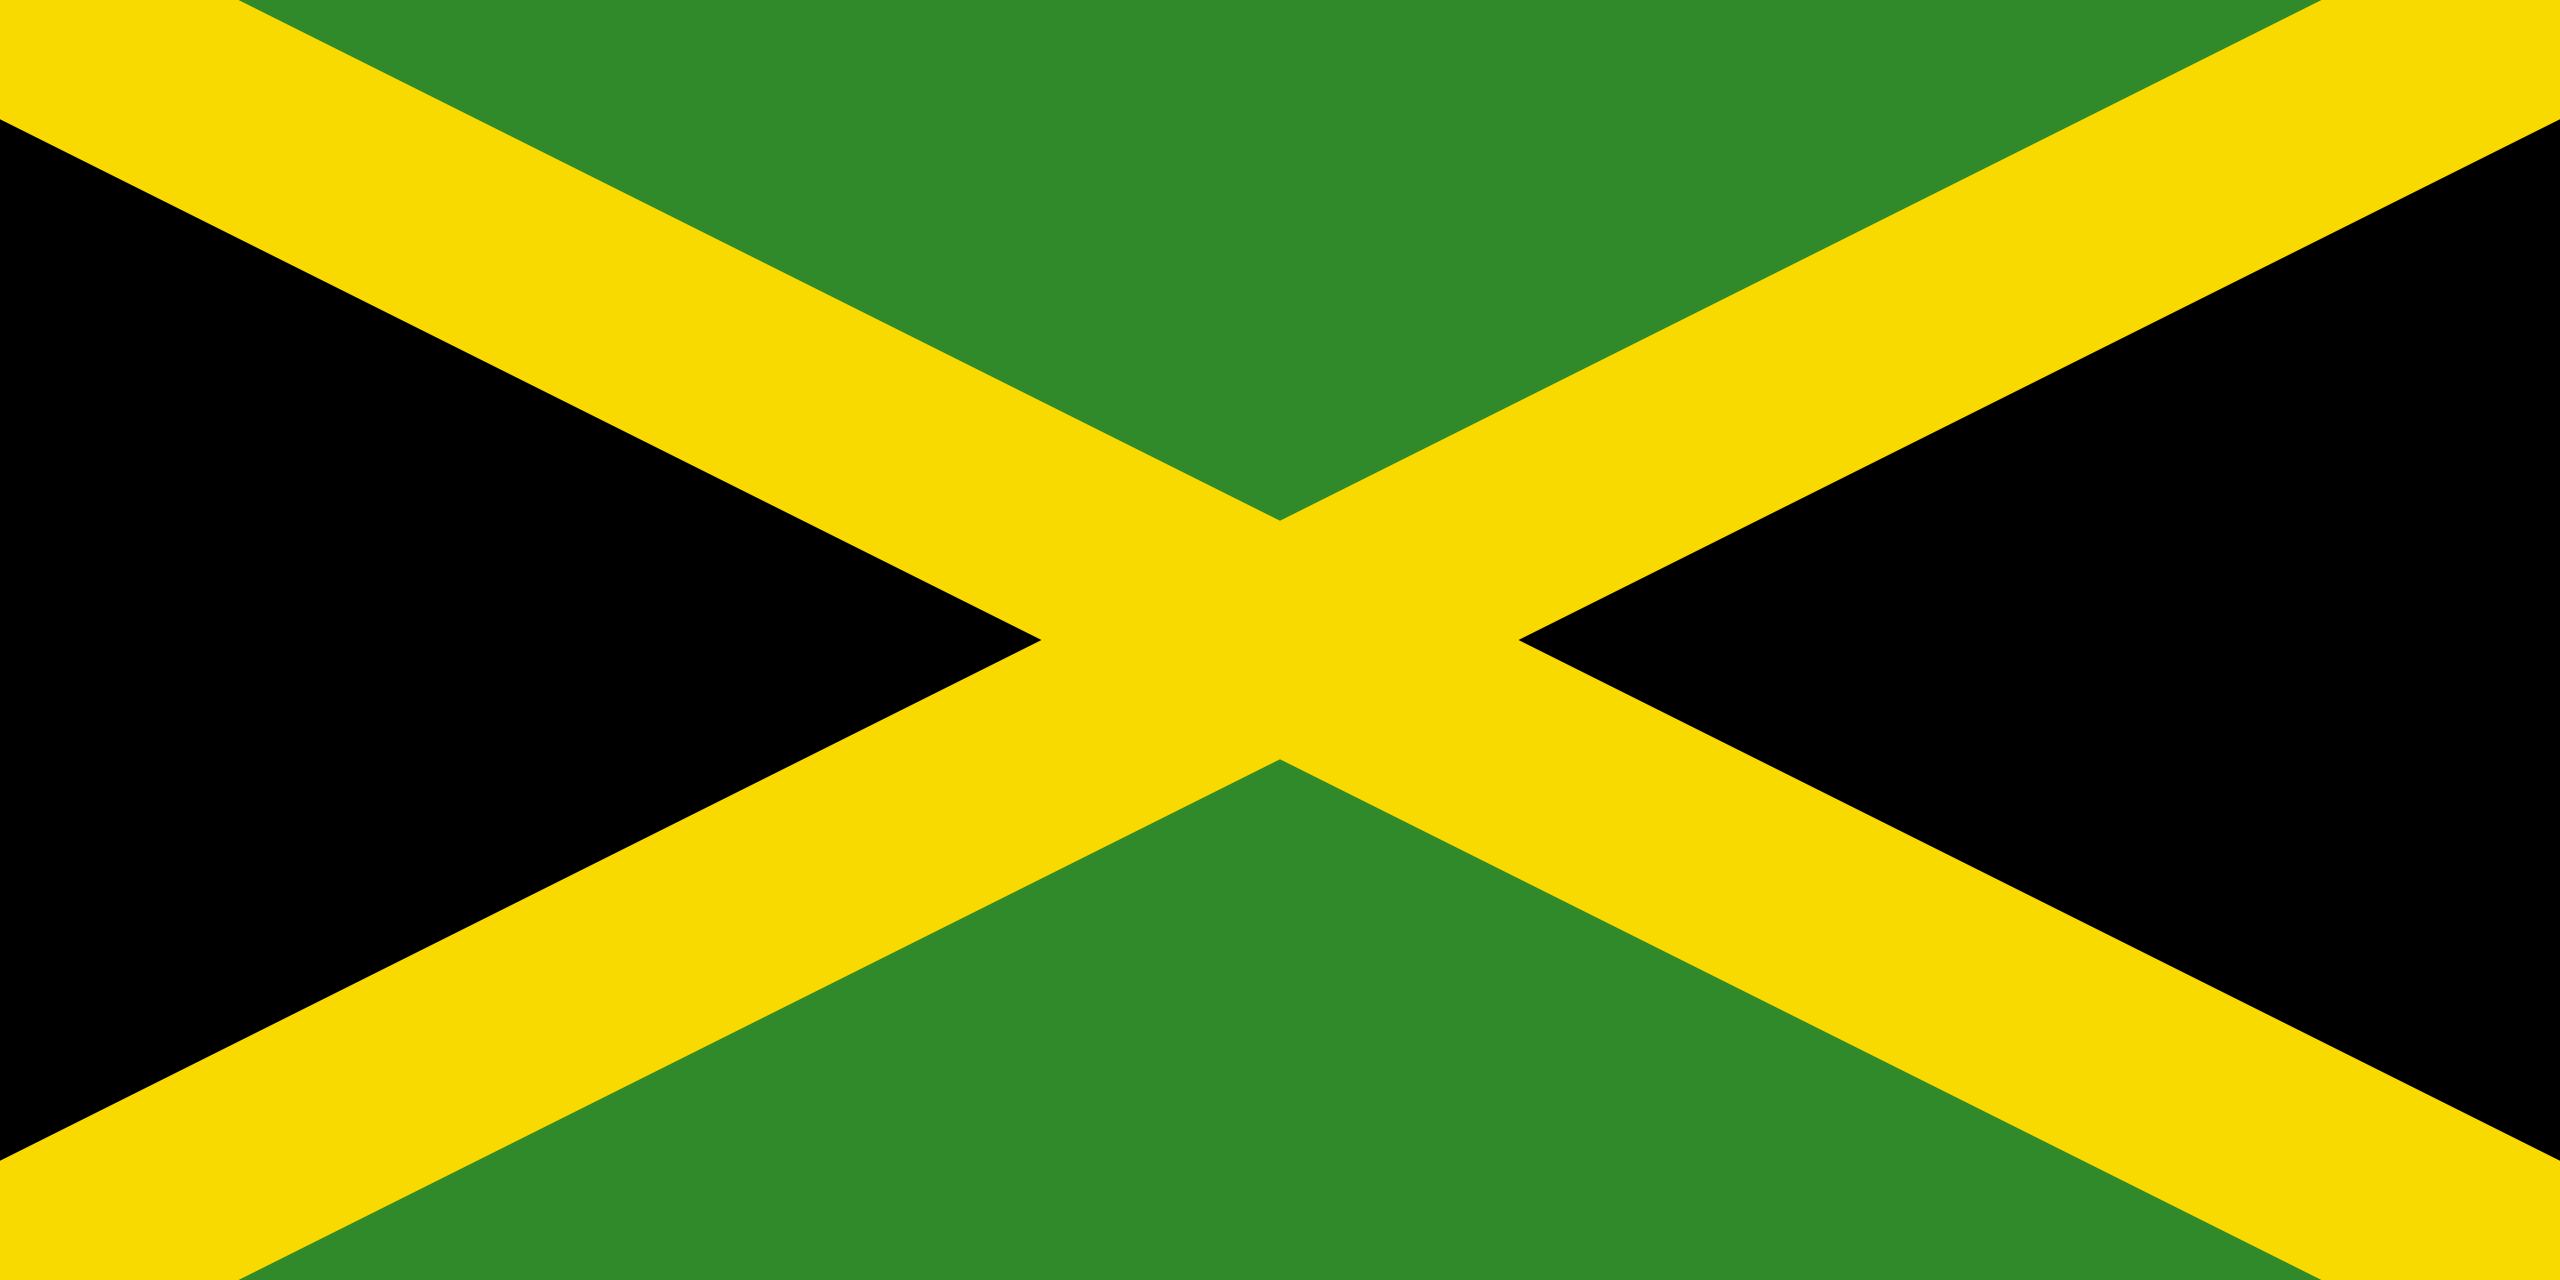 jamaica, 国家, 会徽, 徽标, 符号 - 高清壁纸 - 教授-falken.com